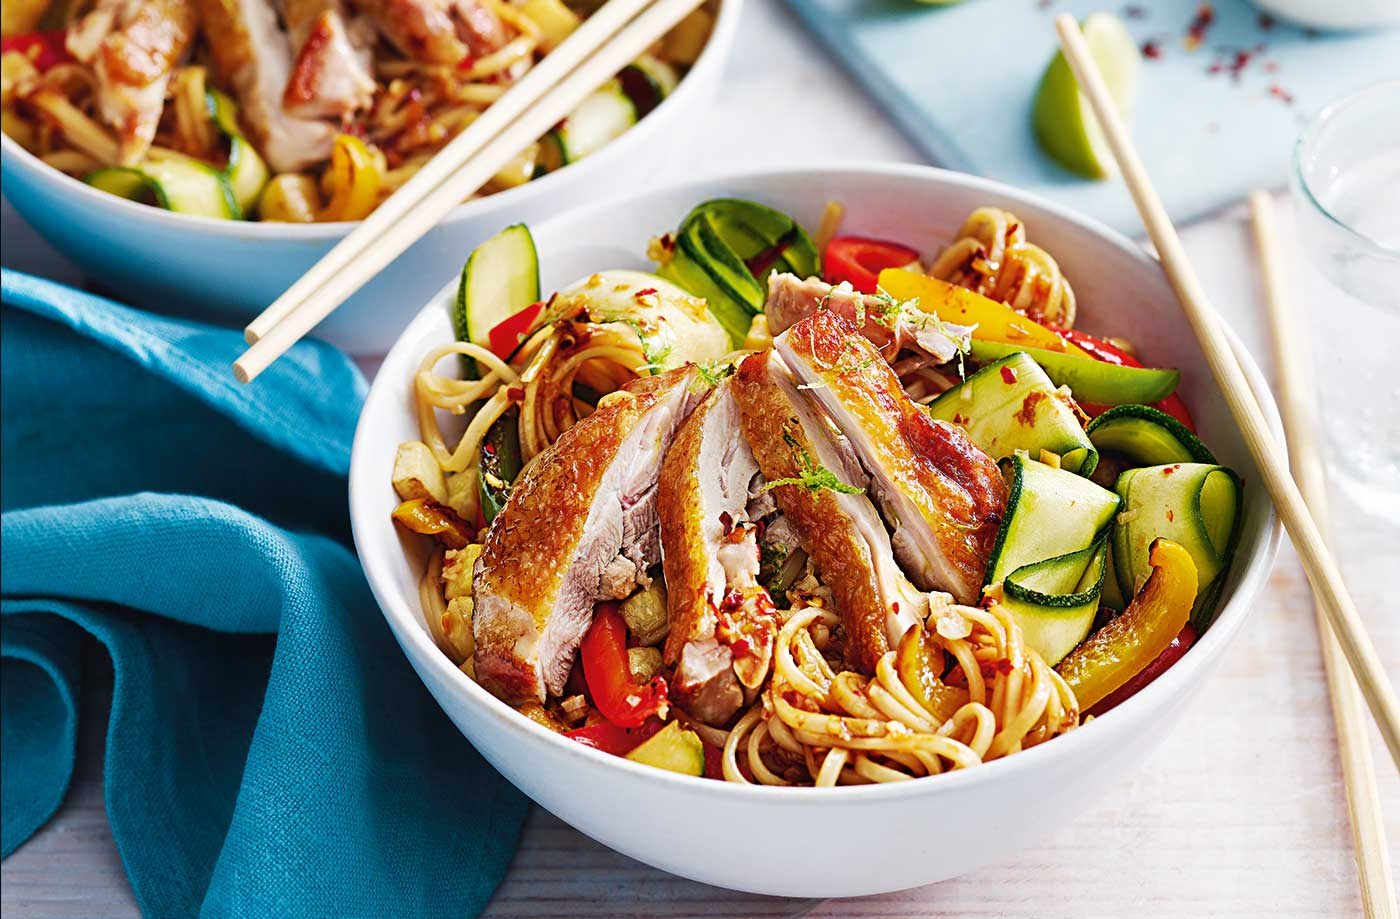 Bang Bang Chicken Noodle Stir Fry Stir Fry Recipes Tesco Real Food